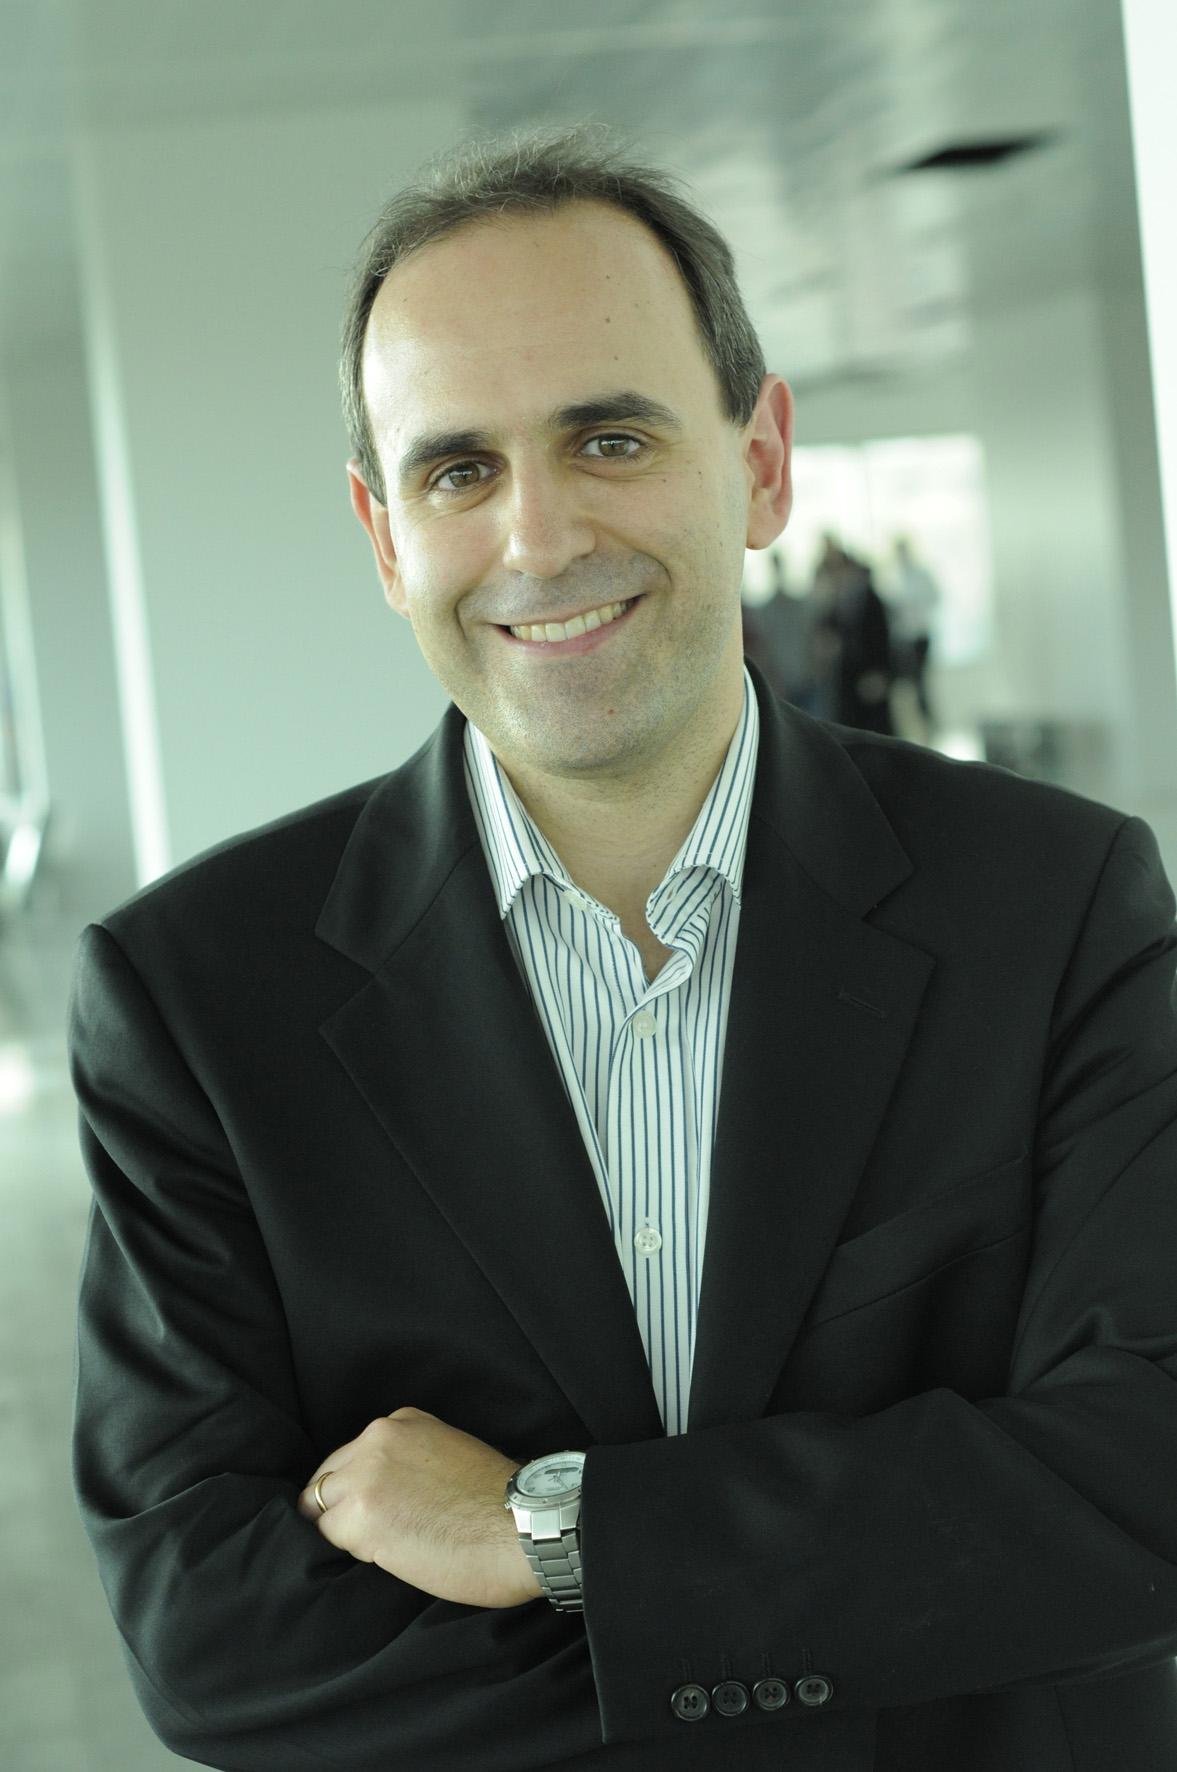 Daniel Guerreiro PERRIGO